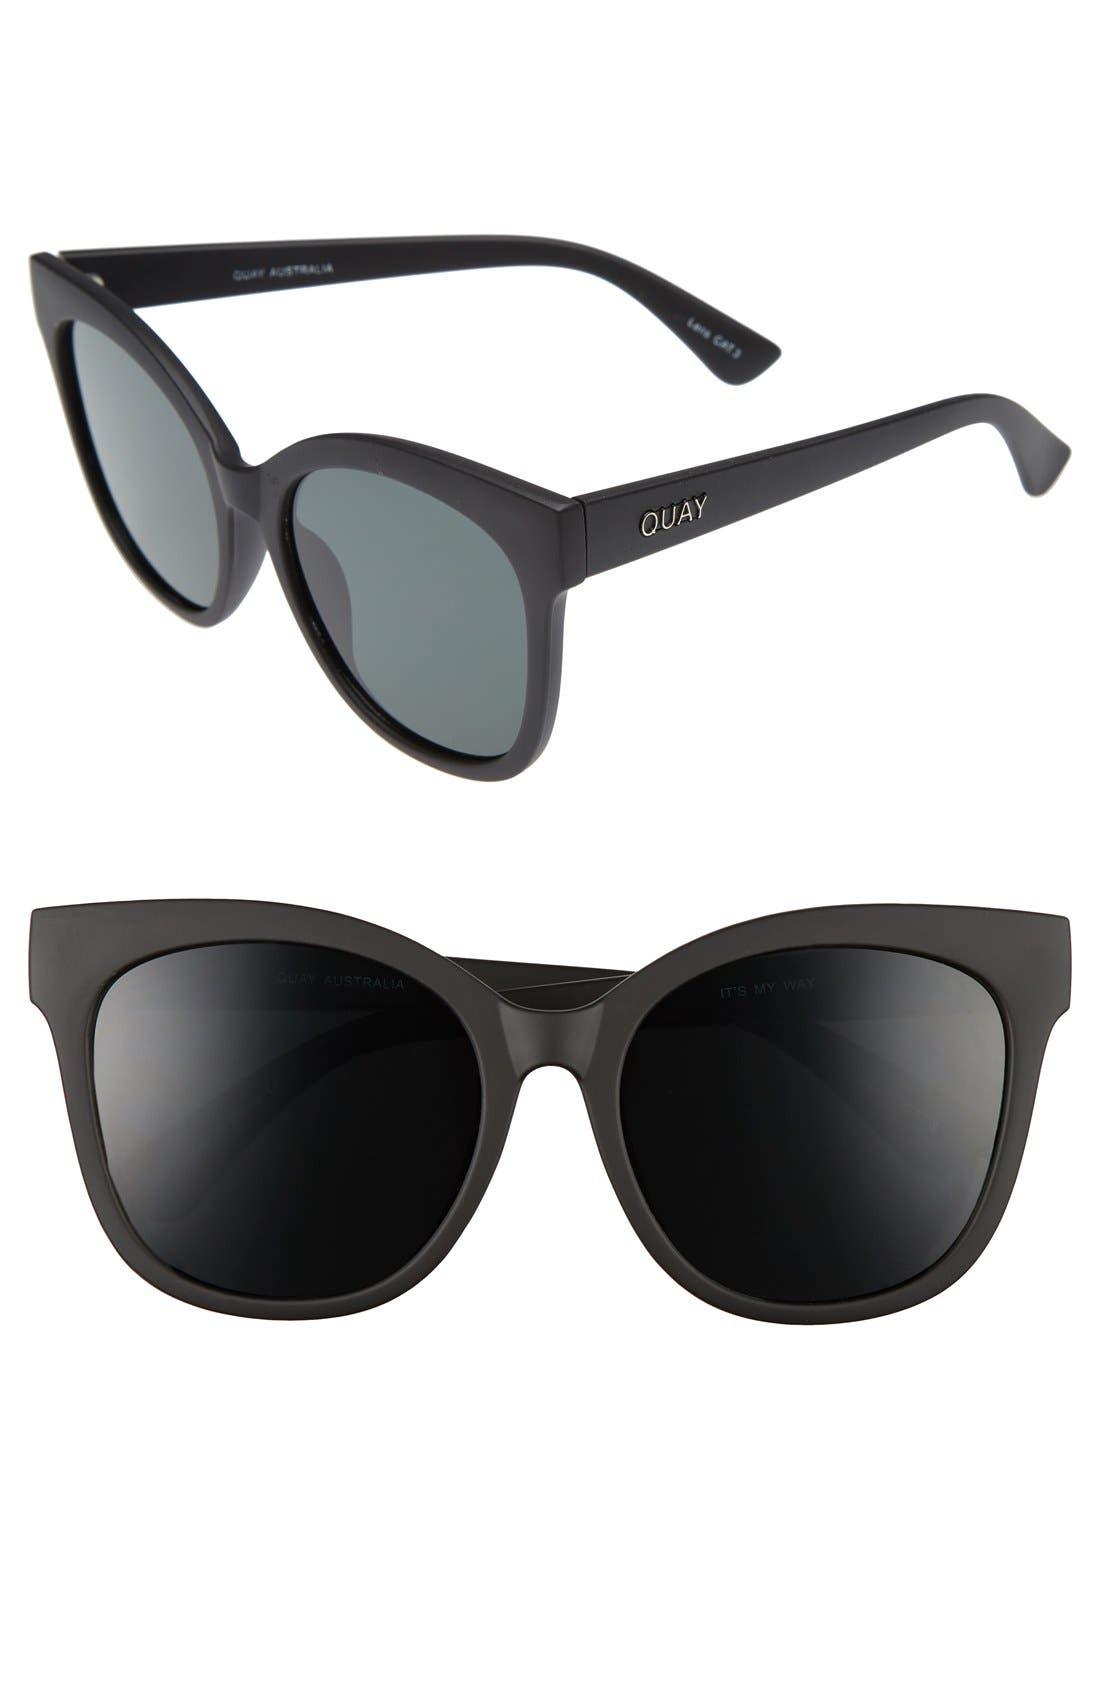 bb42638c4f3 Quay Australia Sunglasses for Women